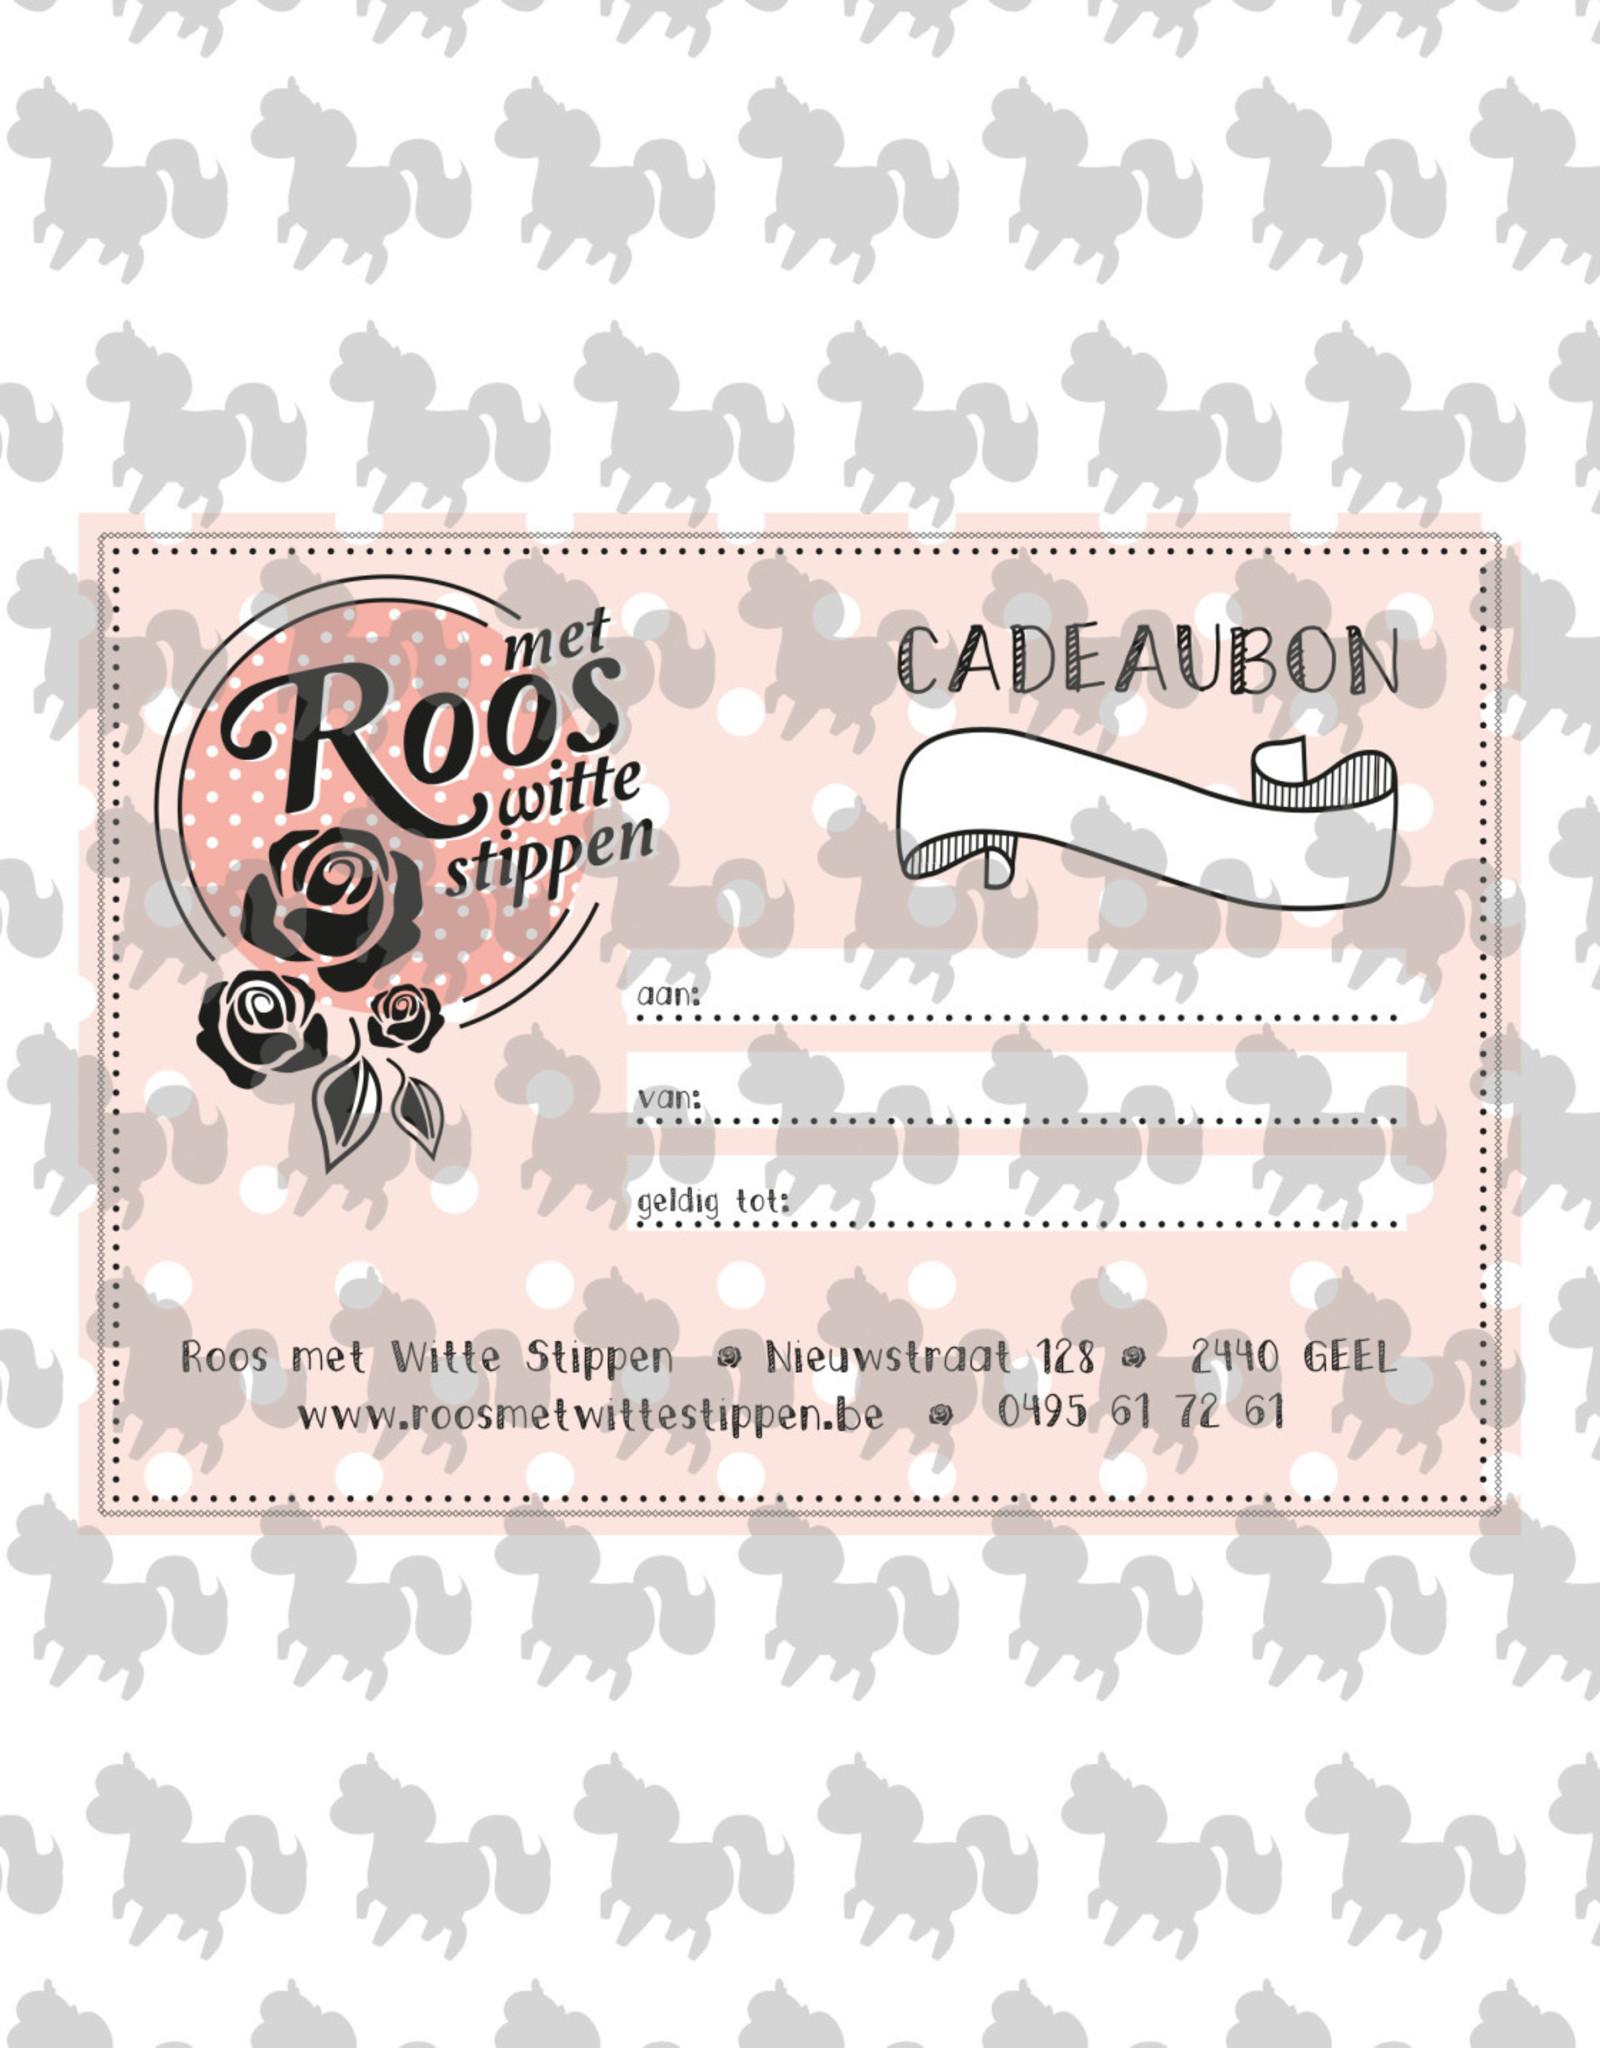 Roos met Witte Stippen Cadeaubon 40 euro